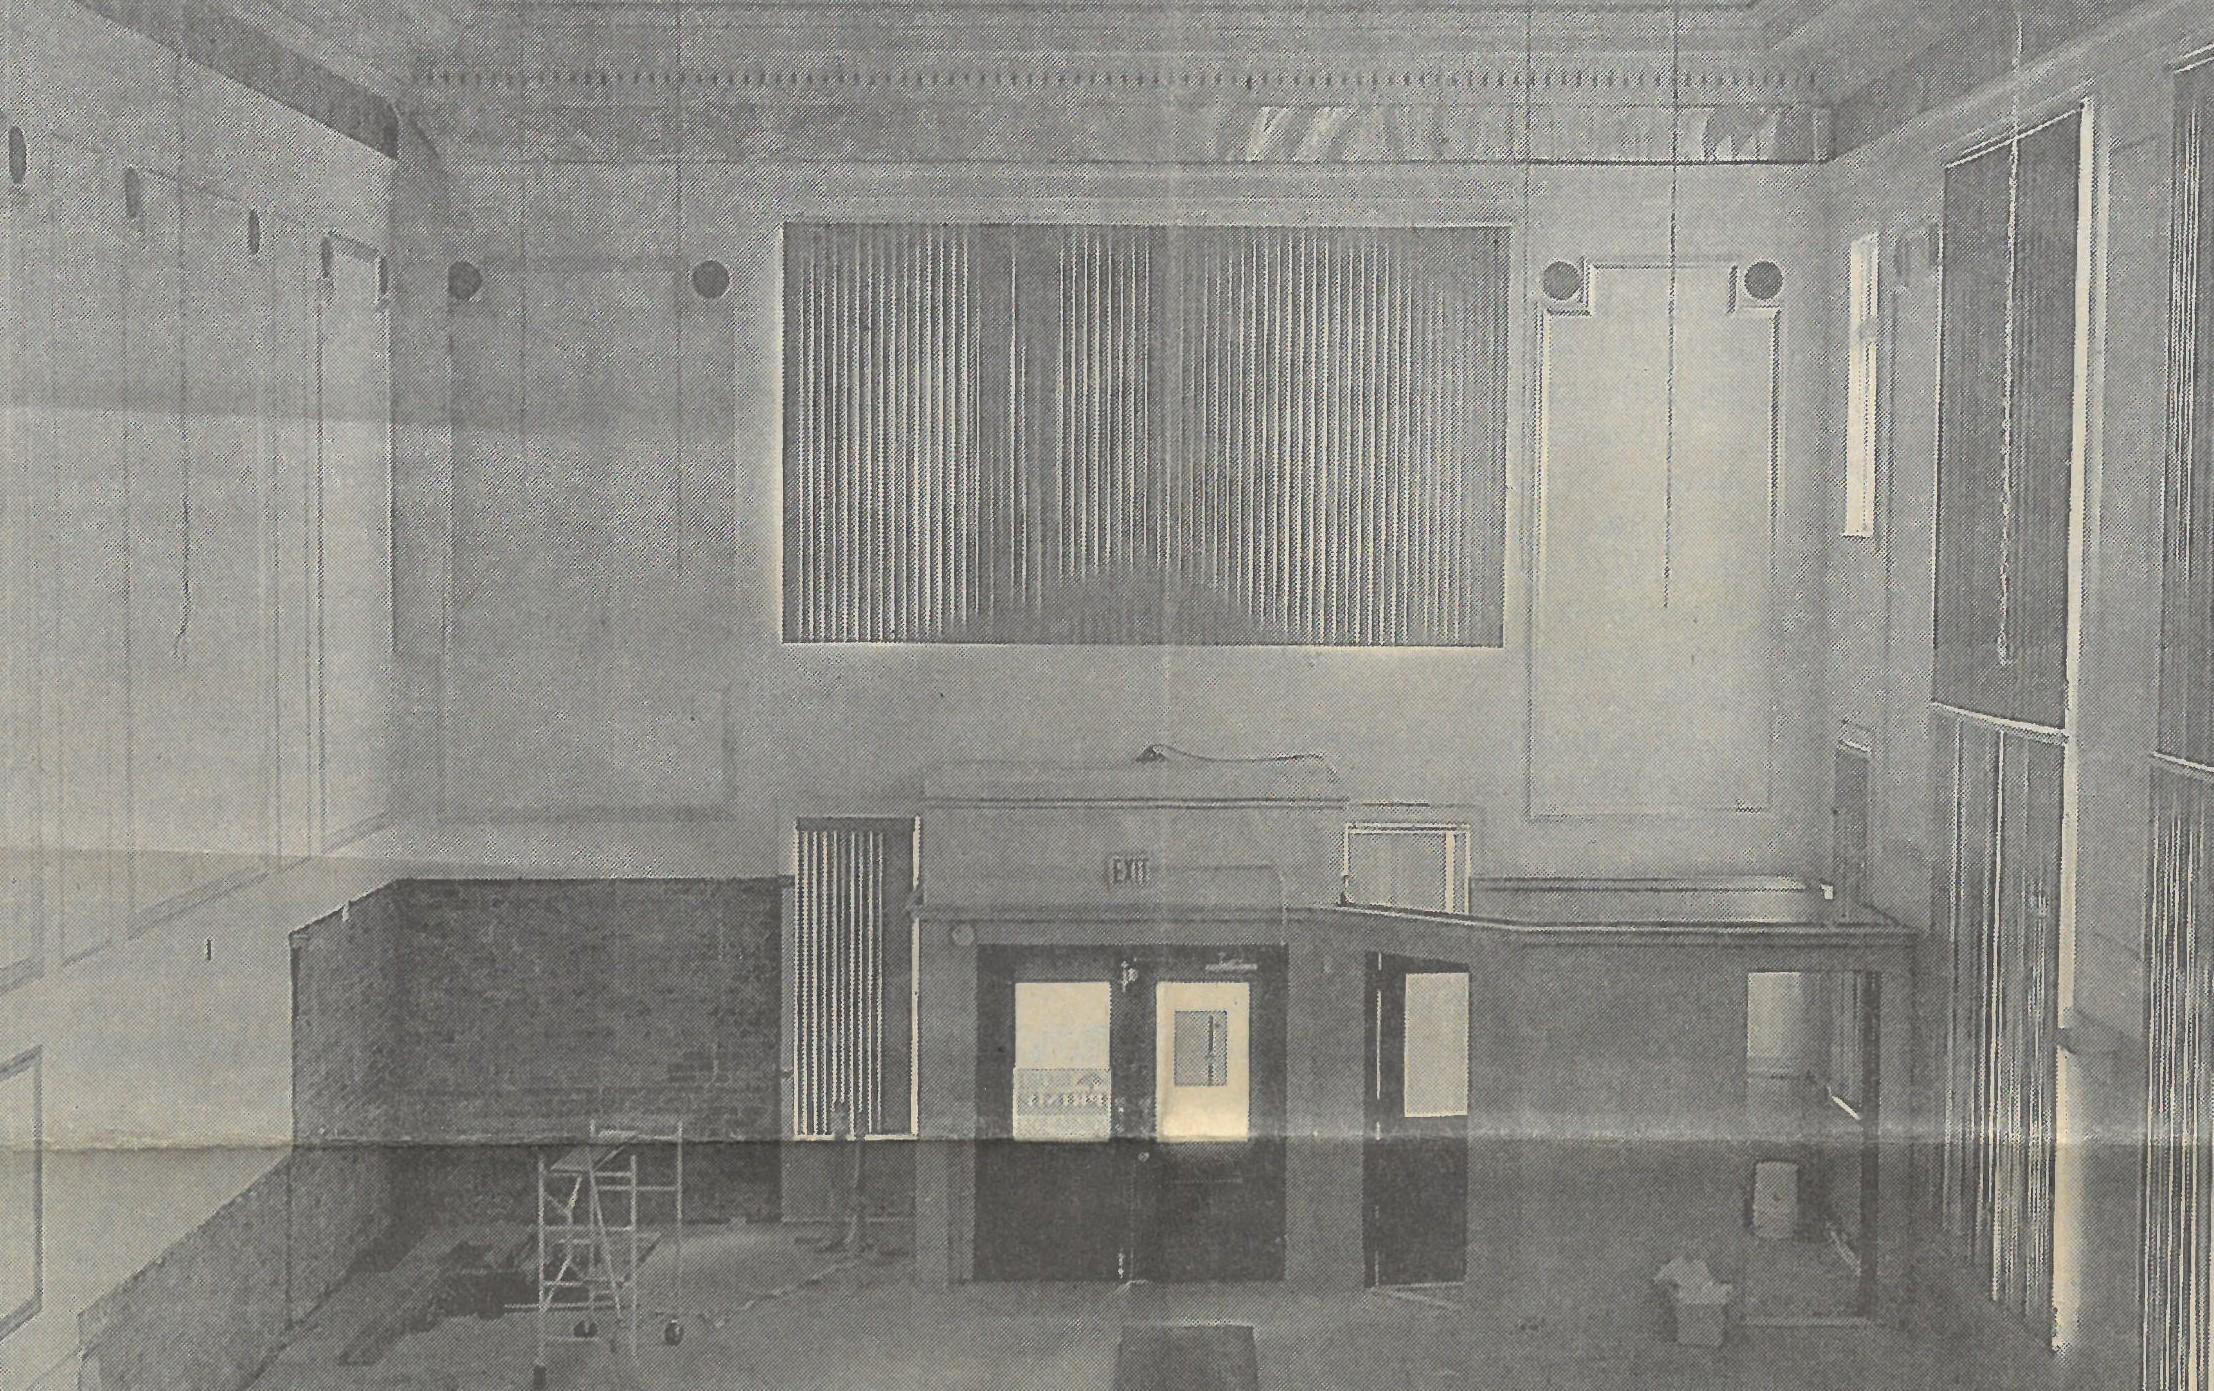 Interior of Bank Building c.2006